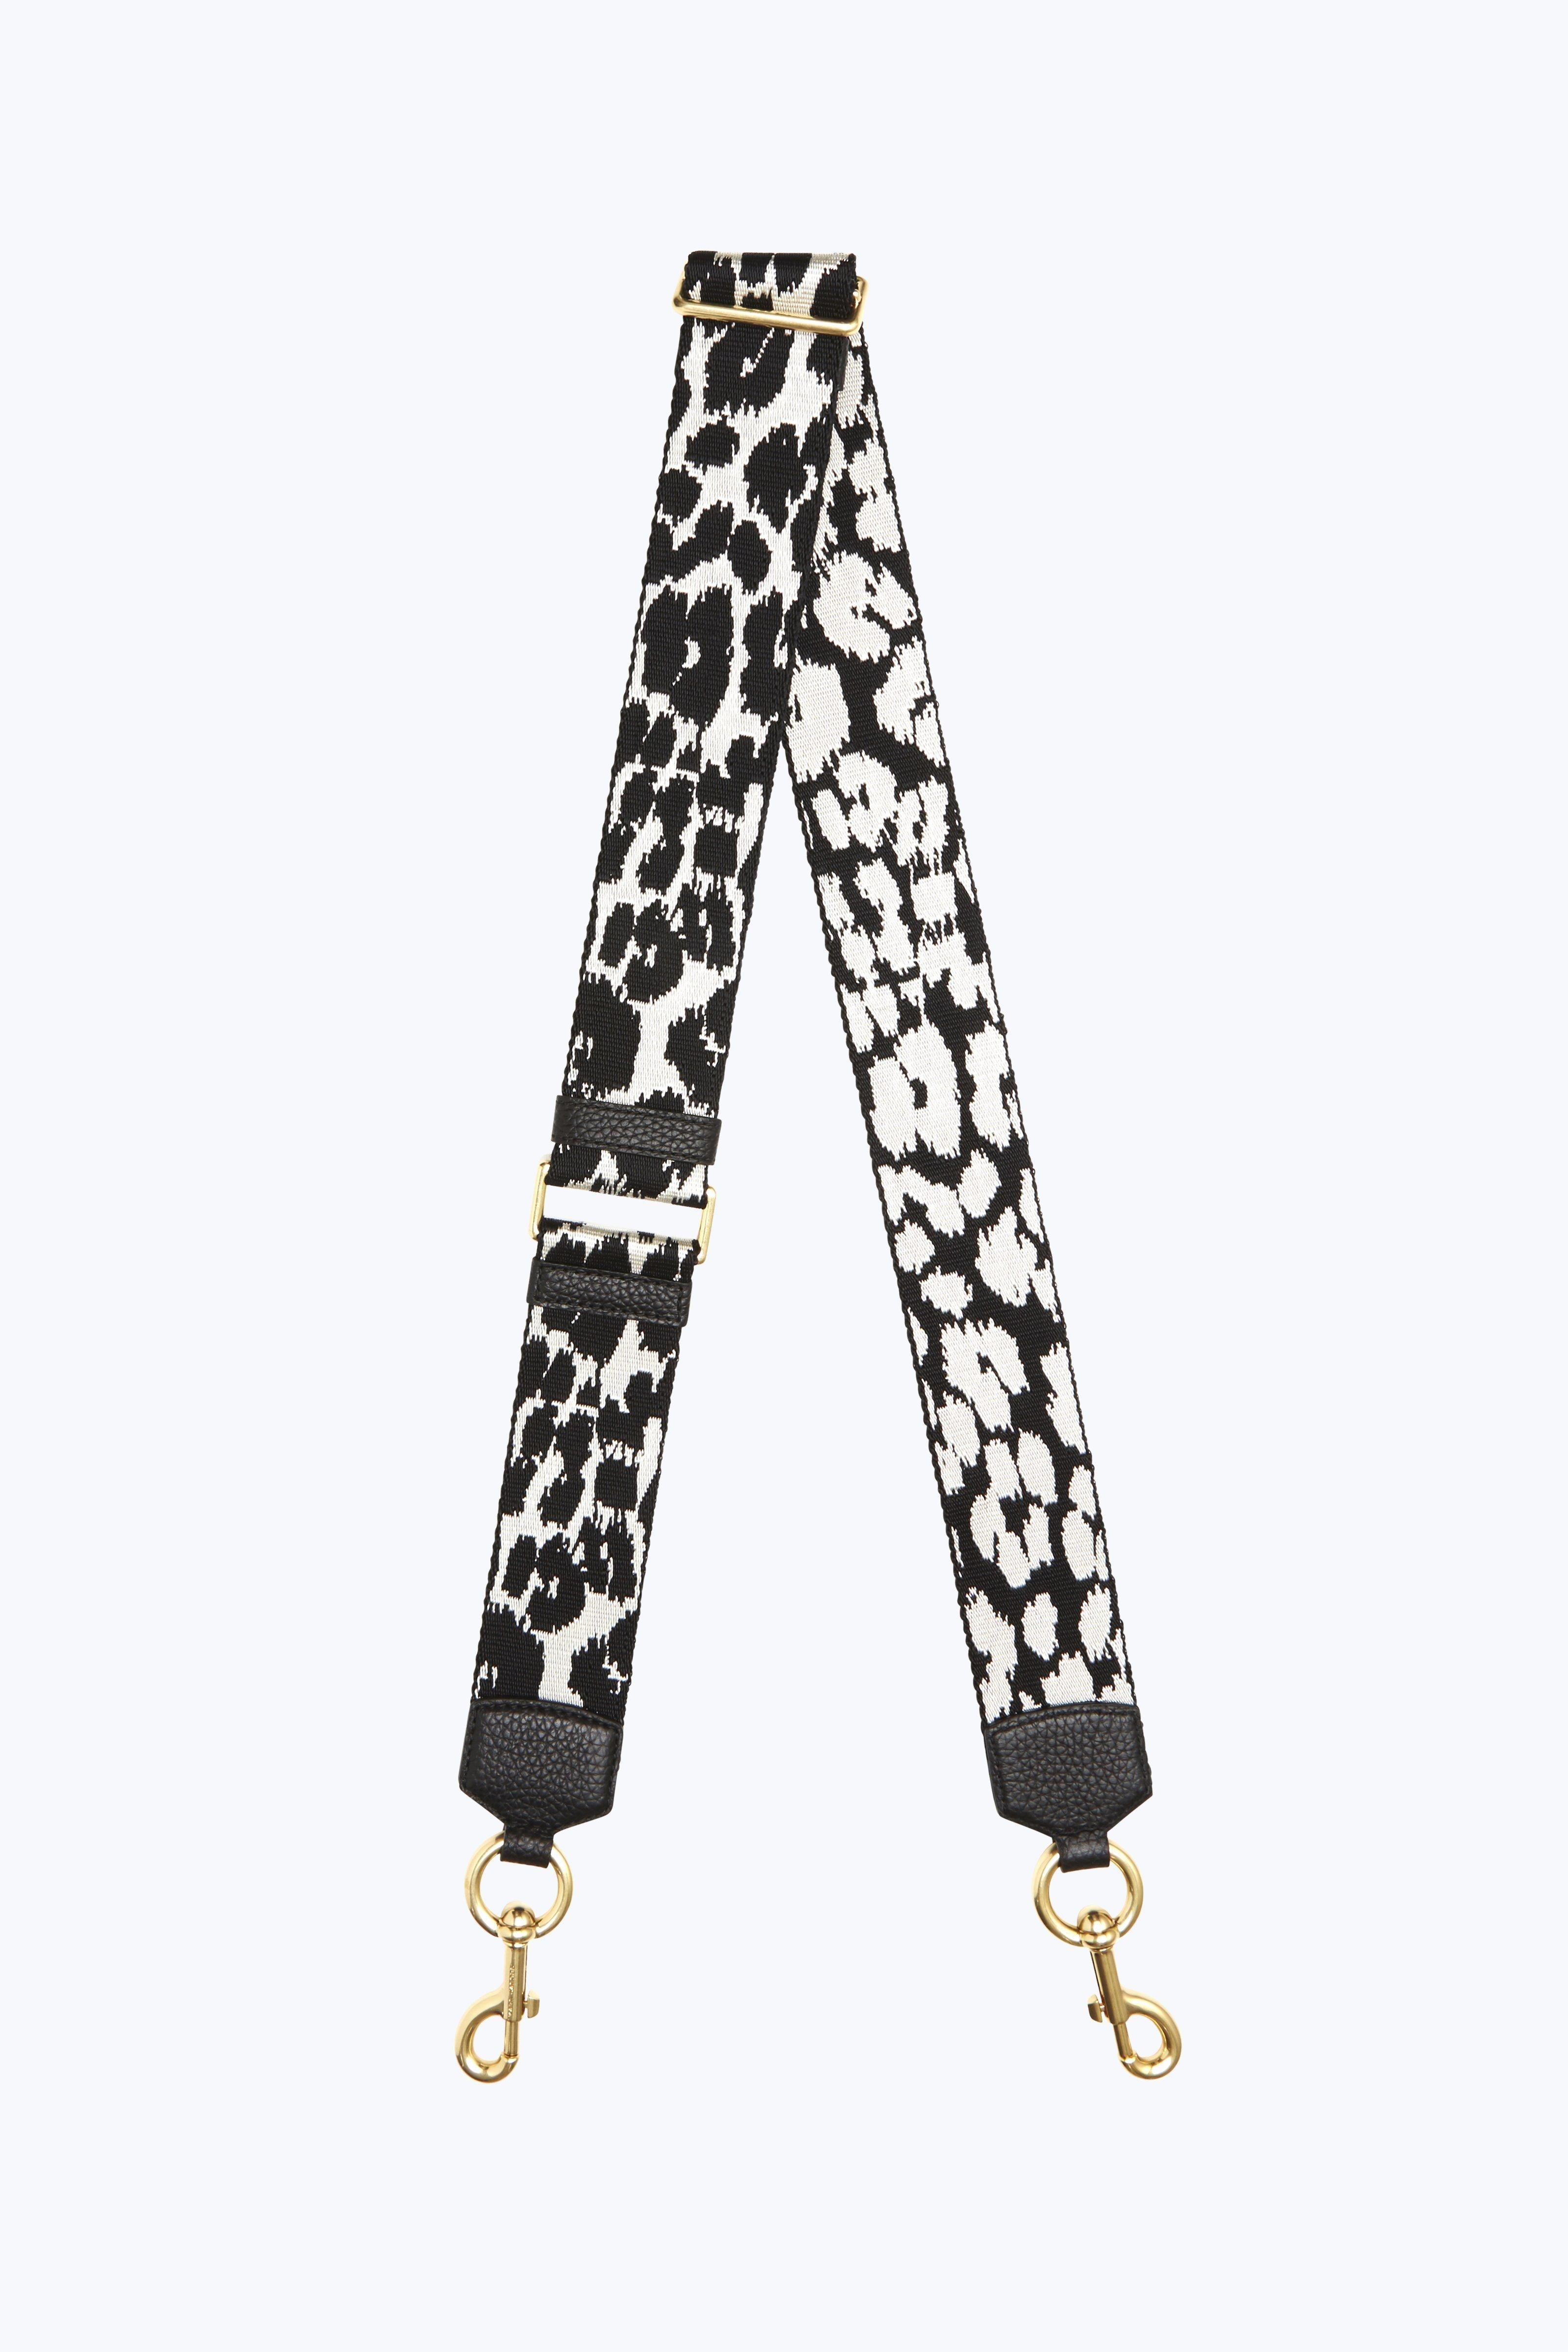 Marc Jacobs Webbed Leopard Bag Strap Marcjacobs